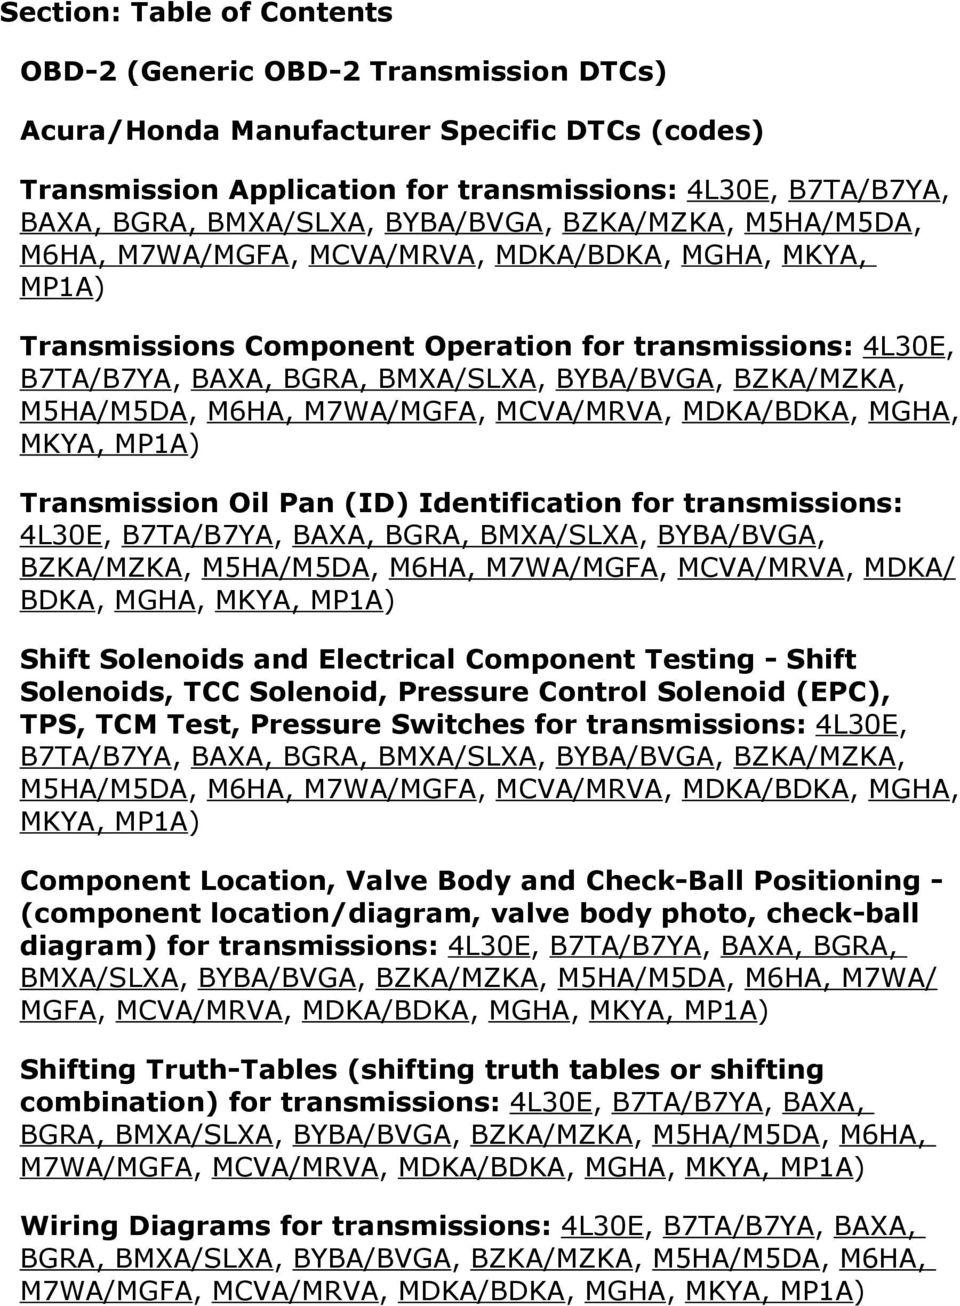 medium resolution of discover other titles by mandy concepcion pdfbzka mzka m5ha m5da m6ha m7wa mgfa